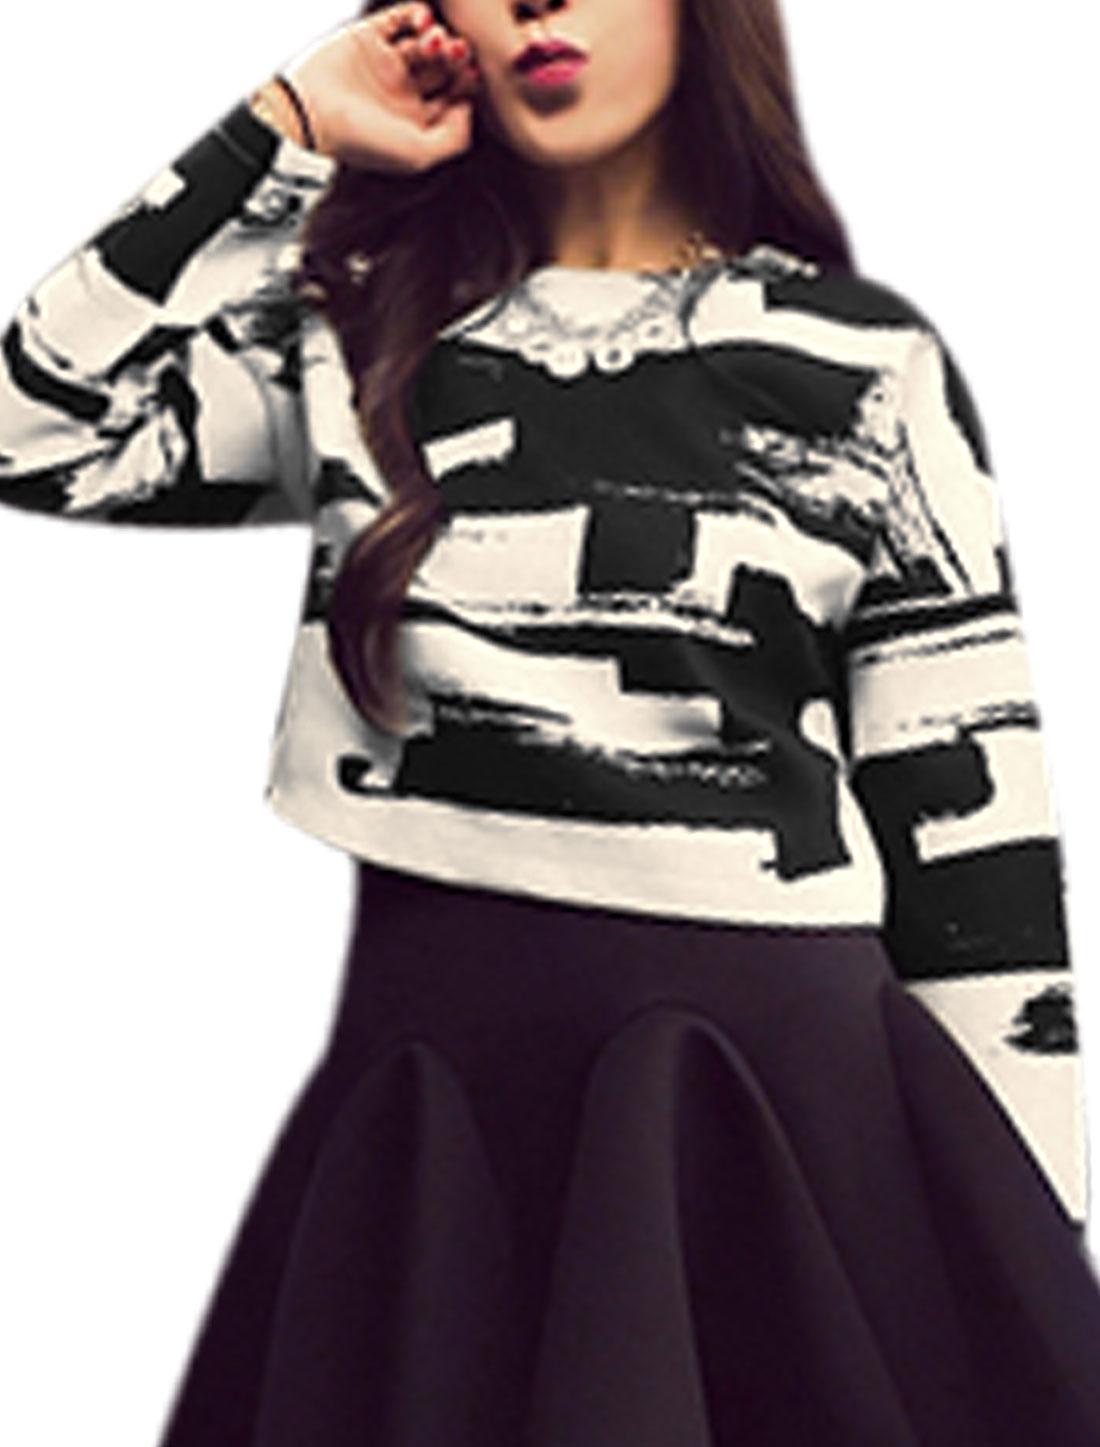 Lady Novelty Prints Hidden Zipper Back Long Sleeve Top Beige Black XS